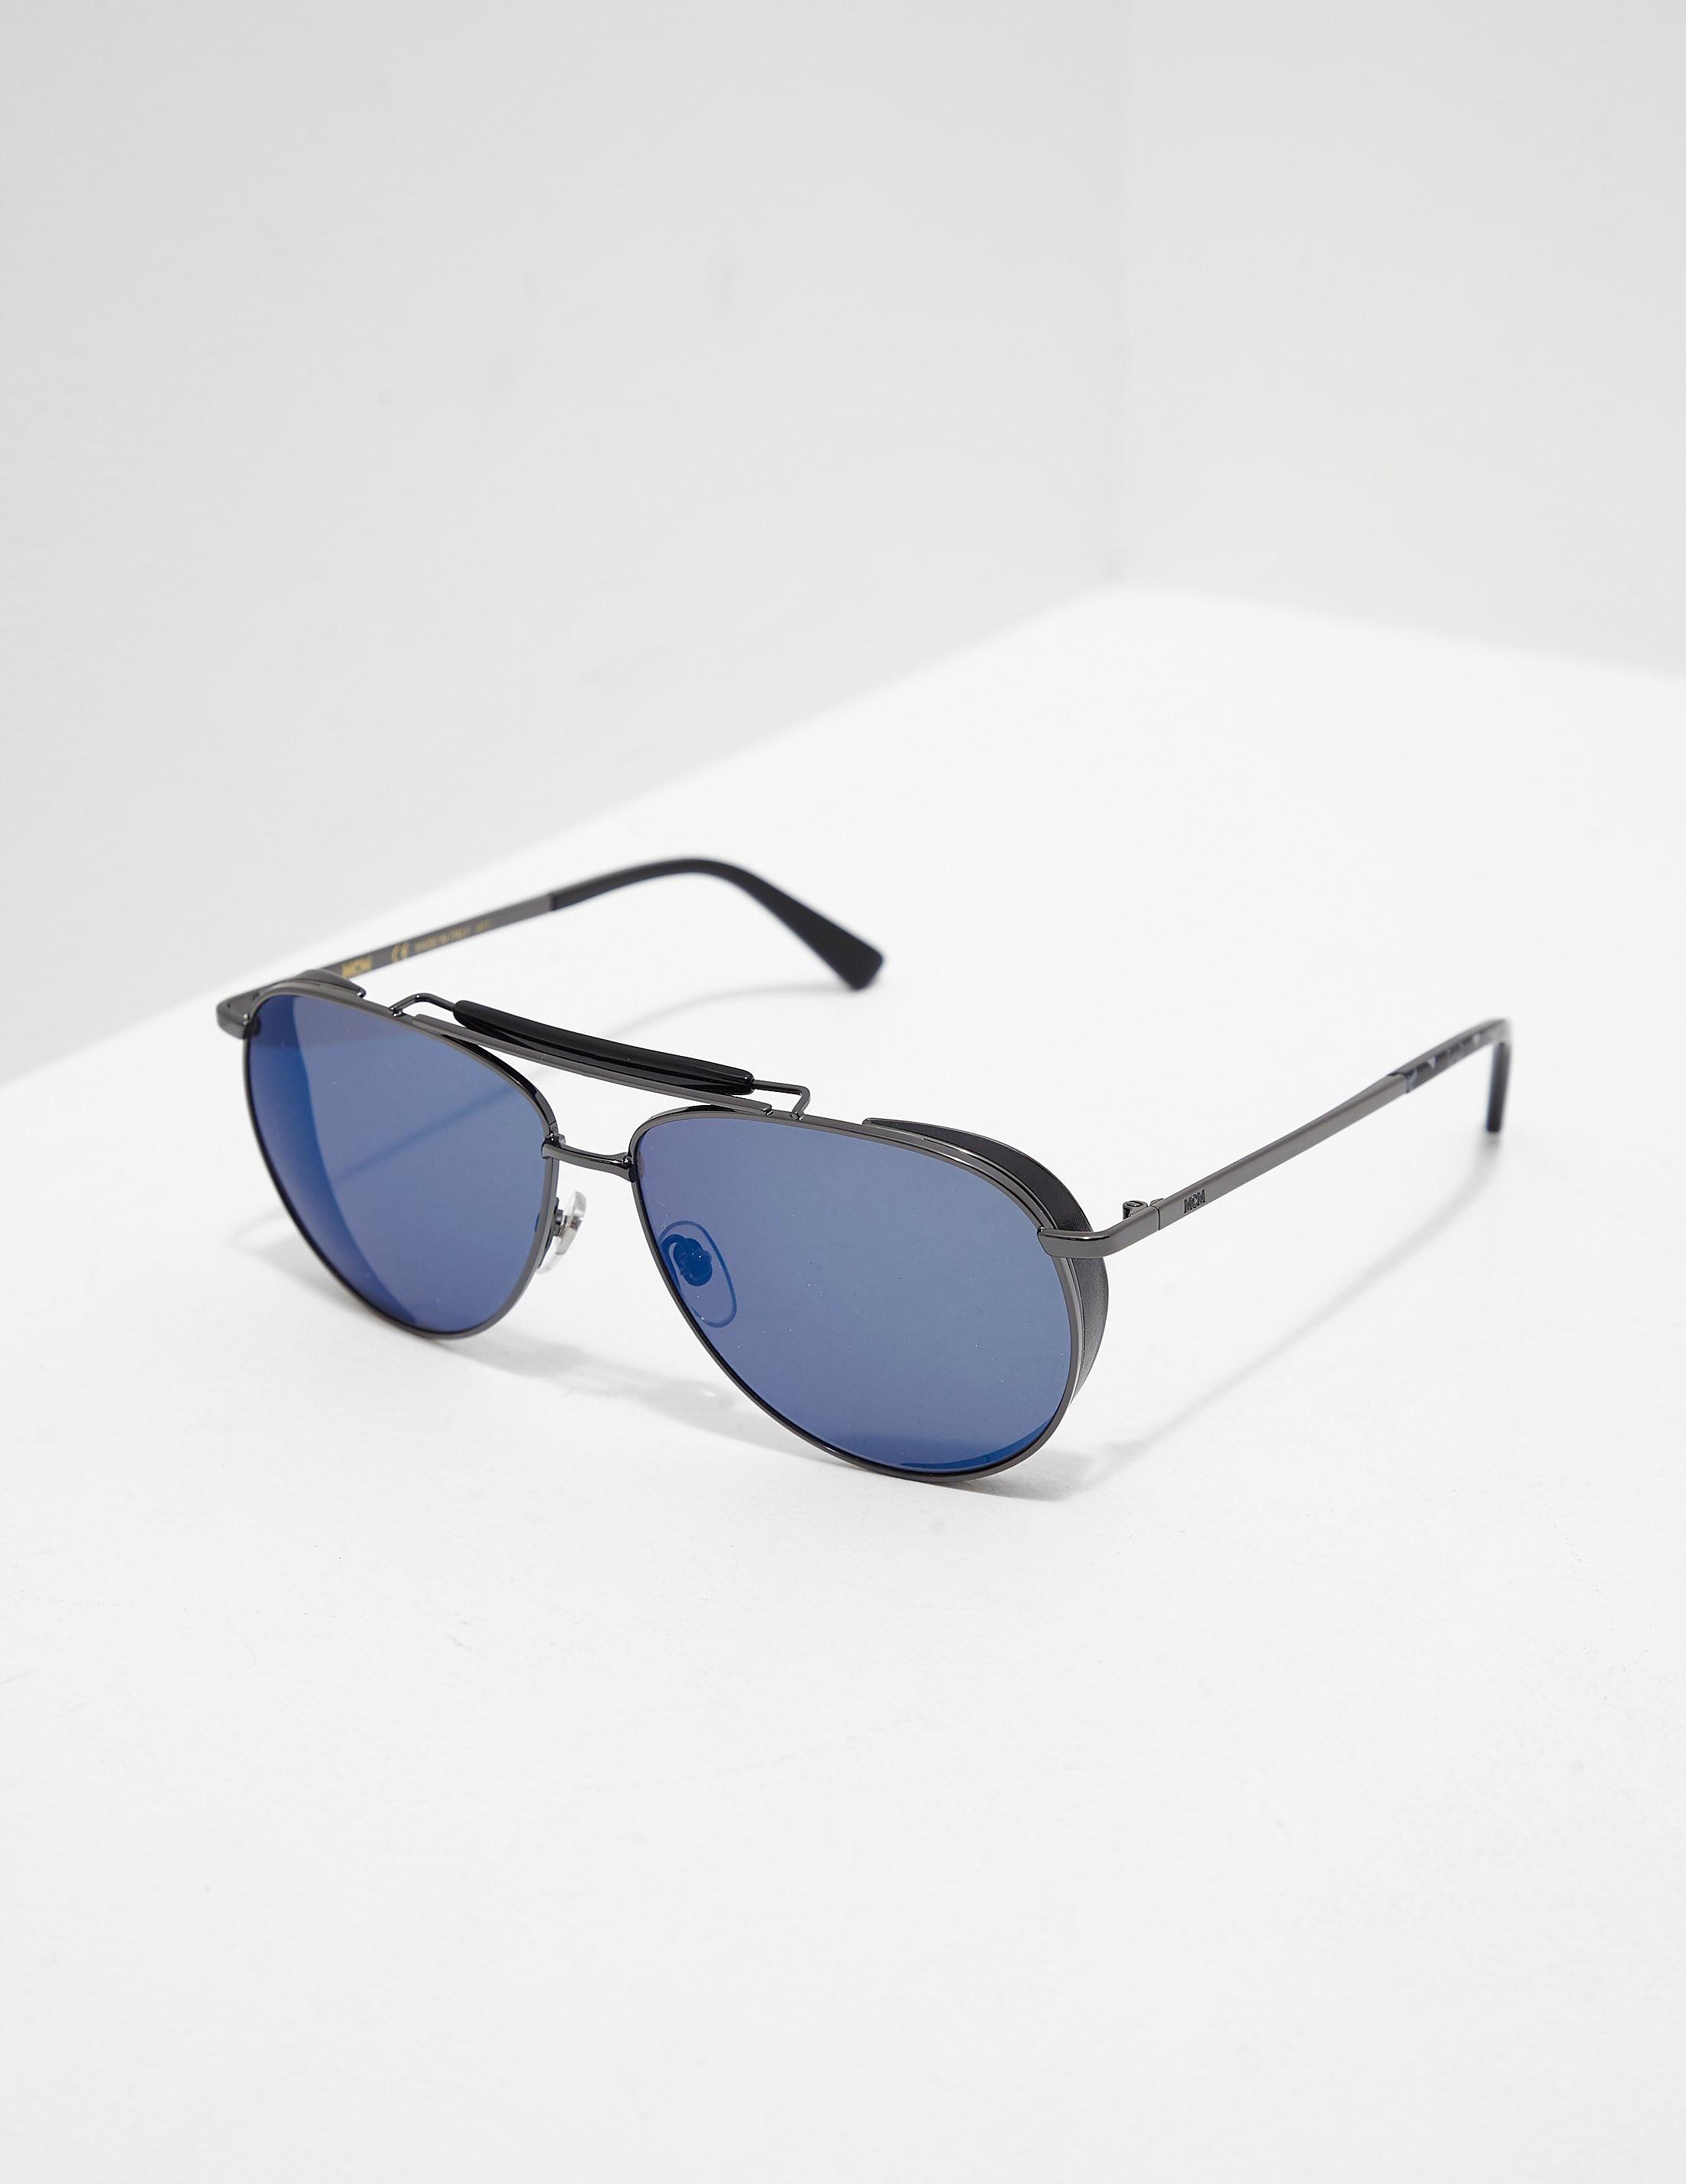 MCM Round Bar Sunglasses